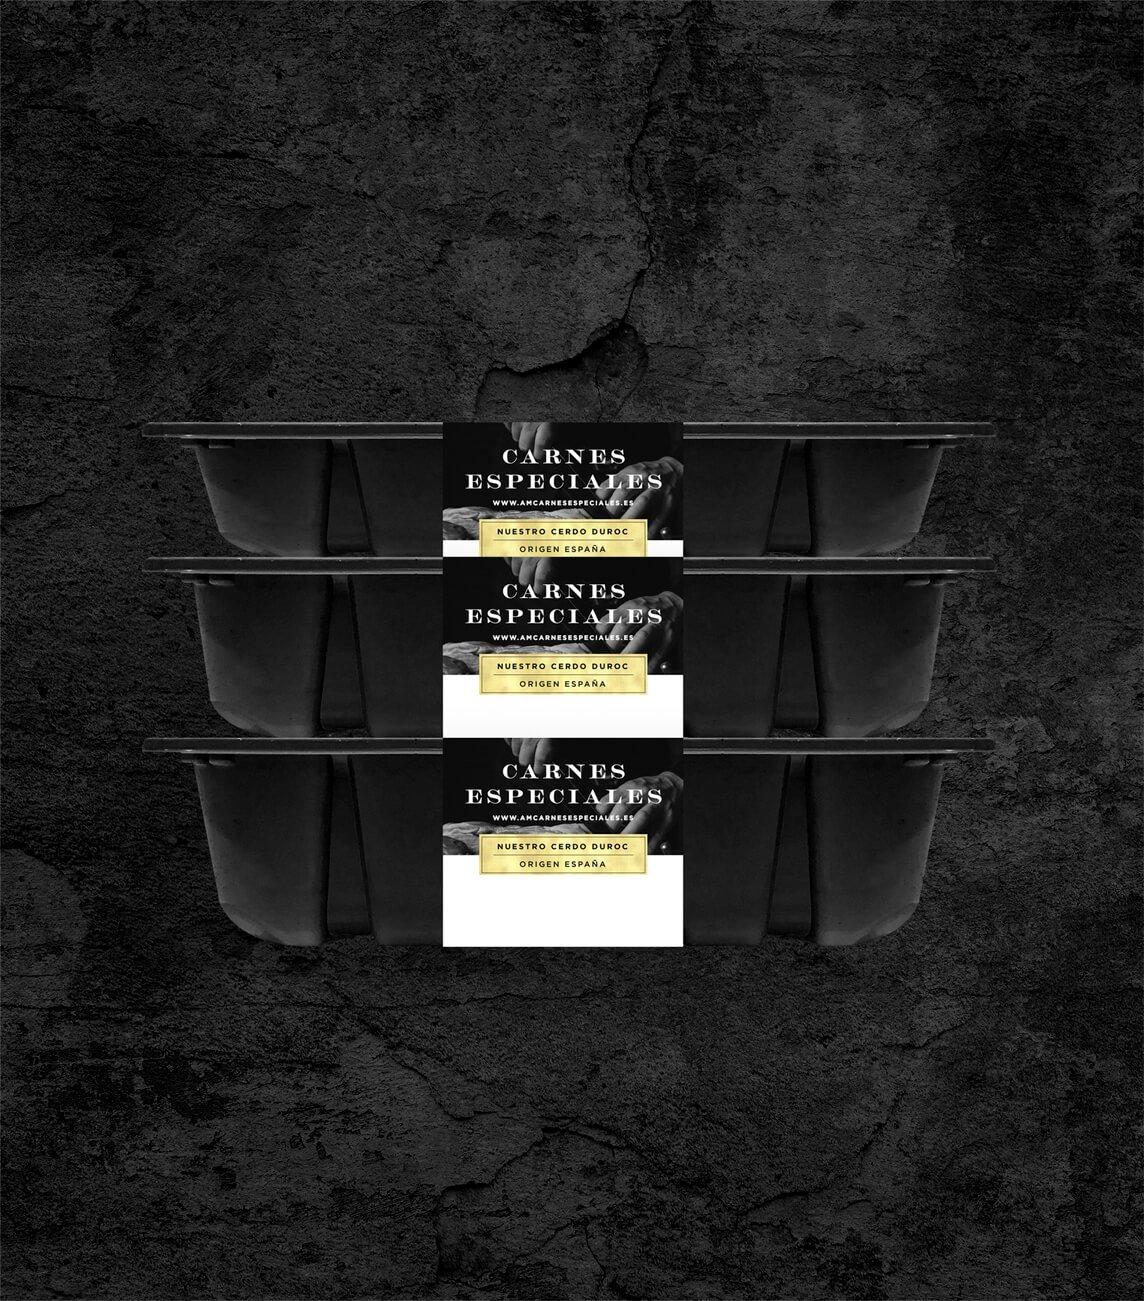 packaging-bandeja-lateral-carne-cerdo-duroc-alejandro-miguel